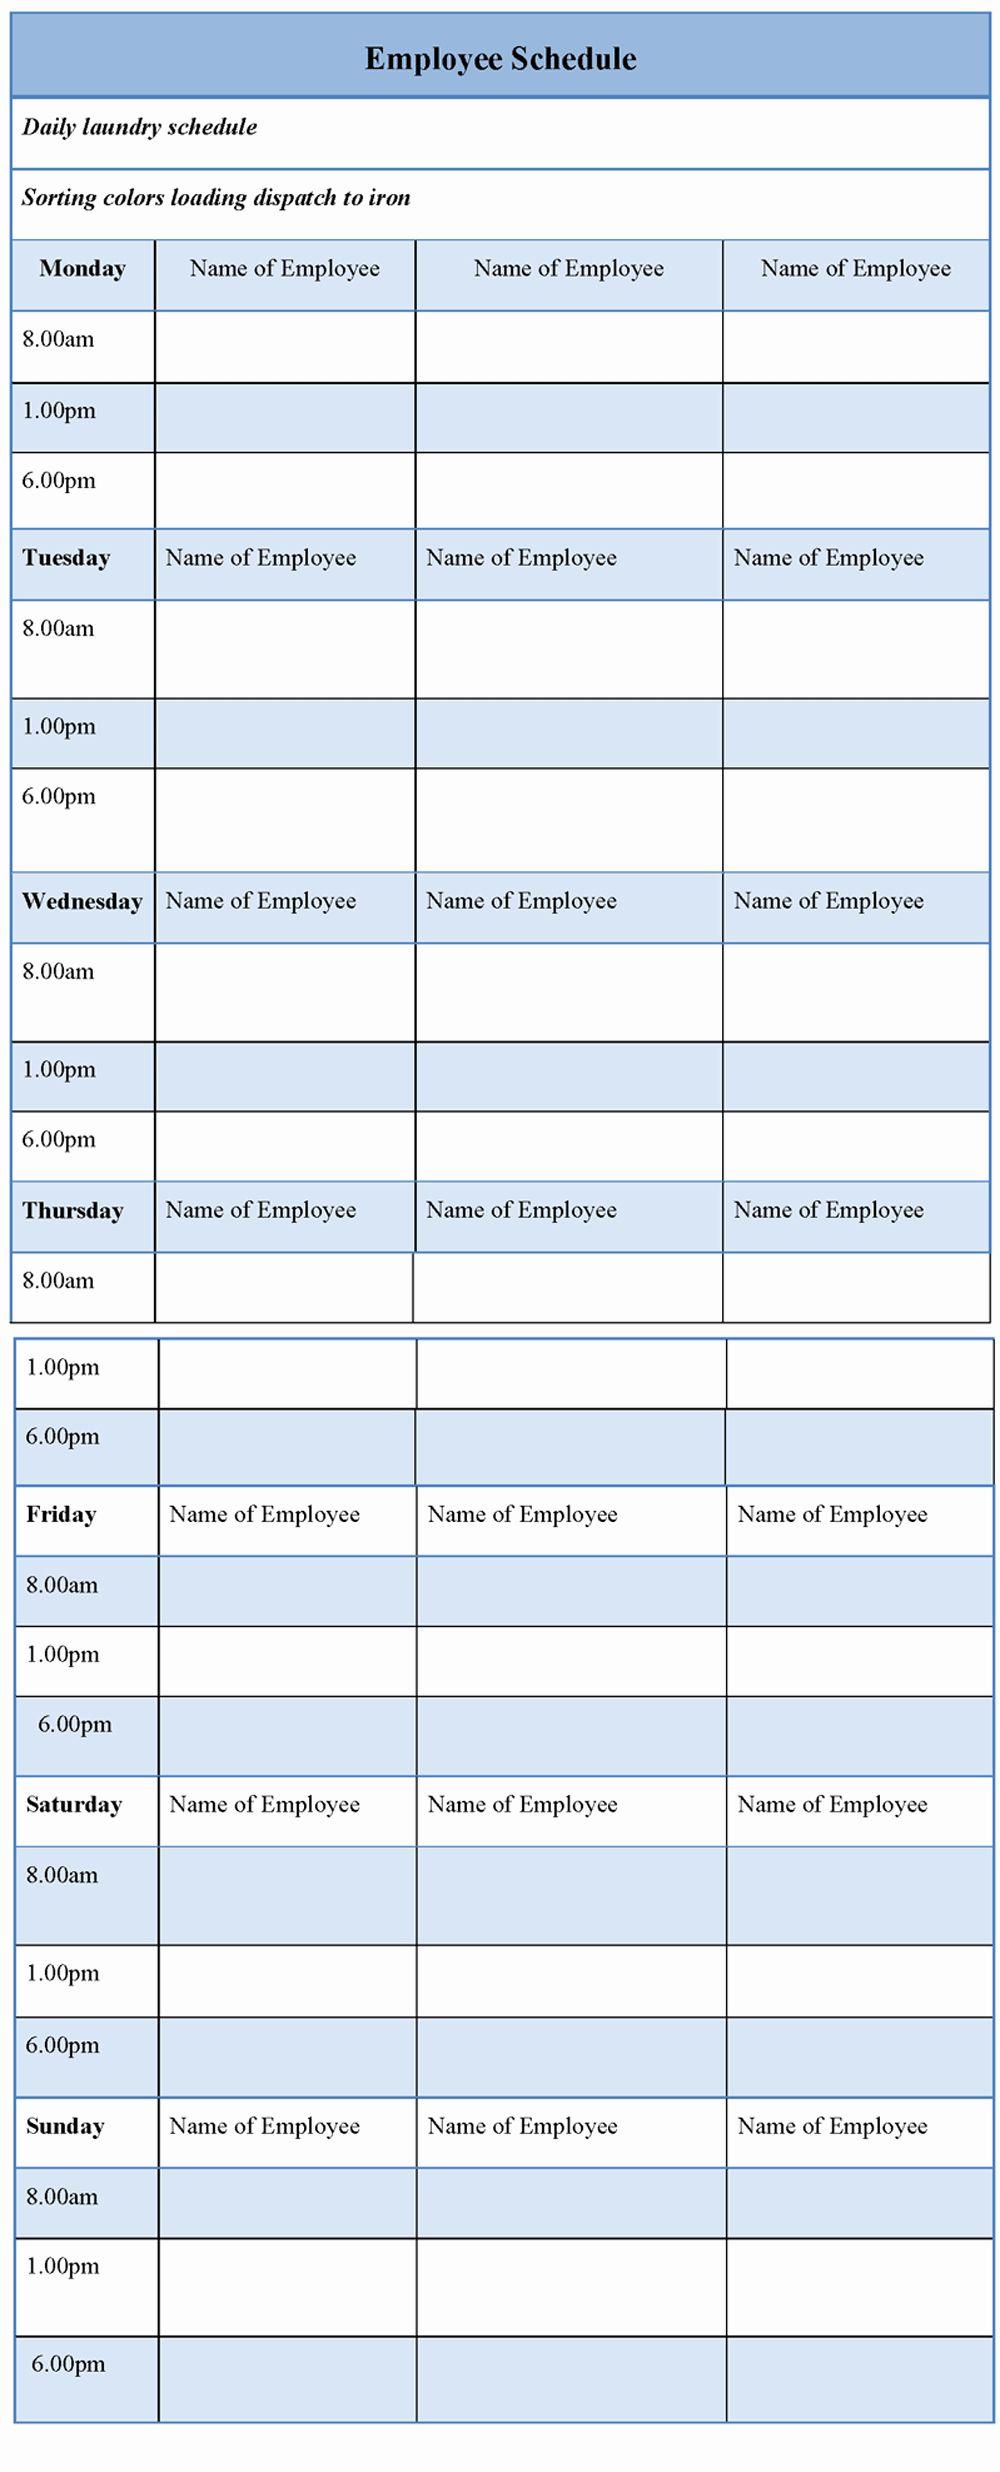 Sample Work Schedule Template New Employee Schedule Example Of Employee Schedule Template Schedule Template Funeral Program Template Free Brochure Template